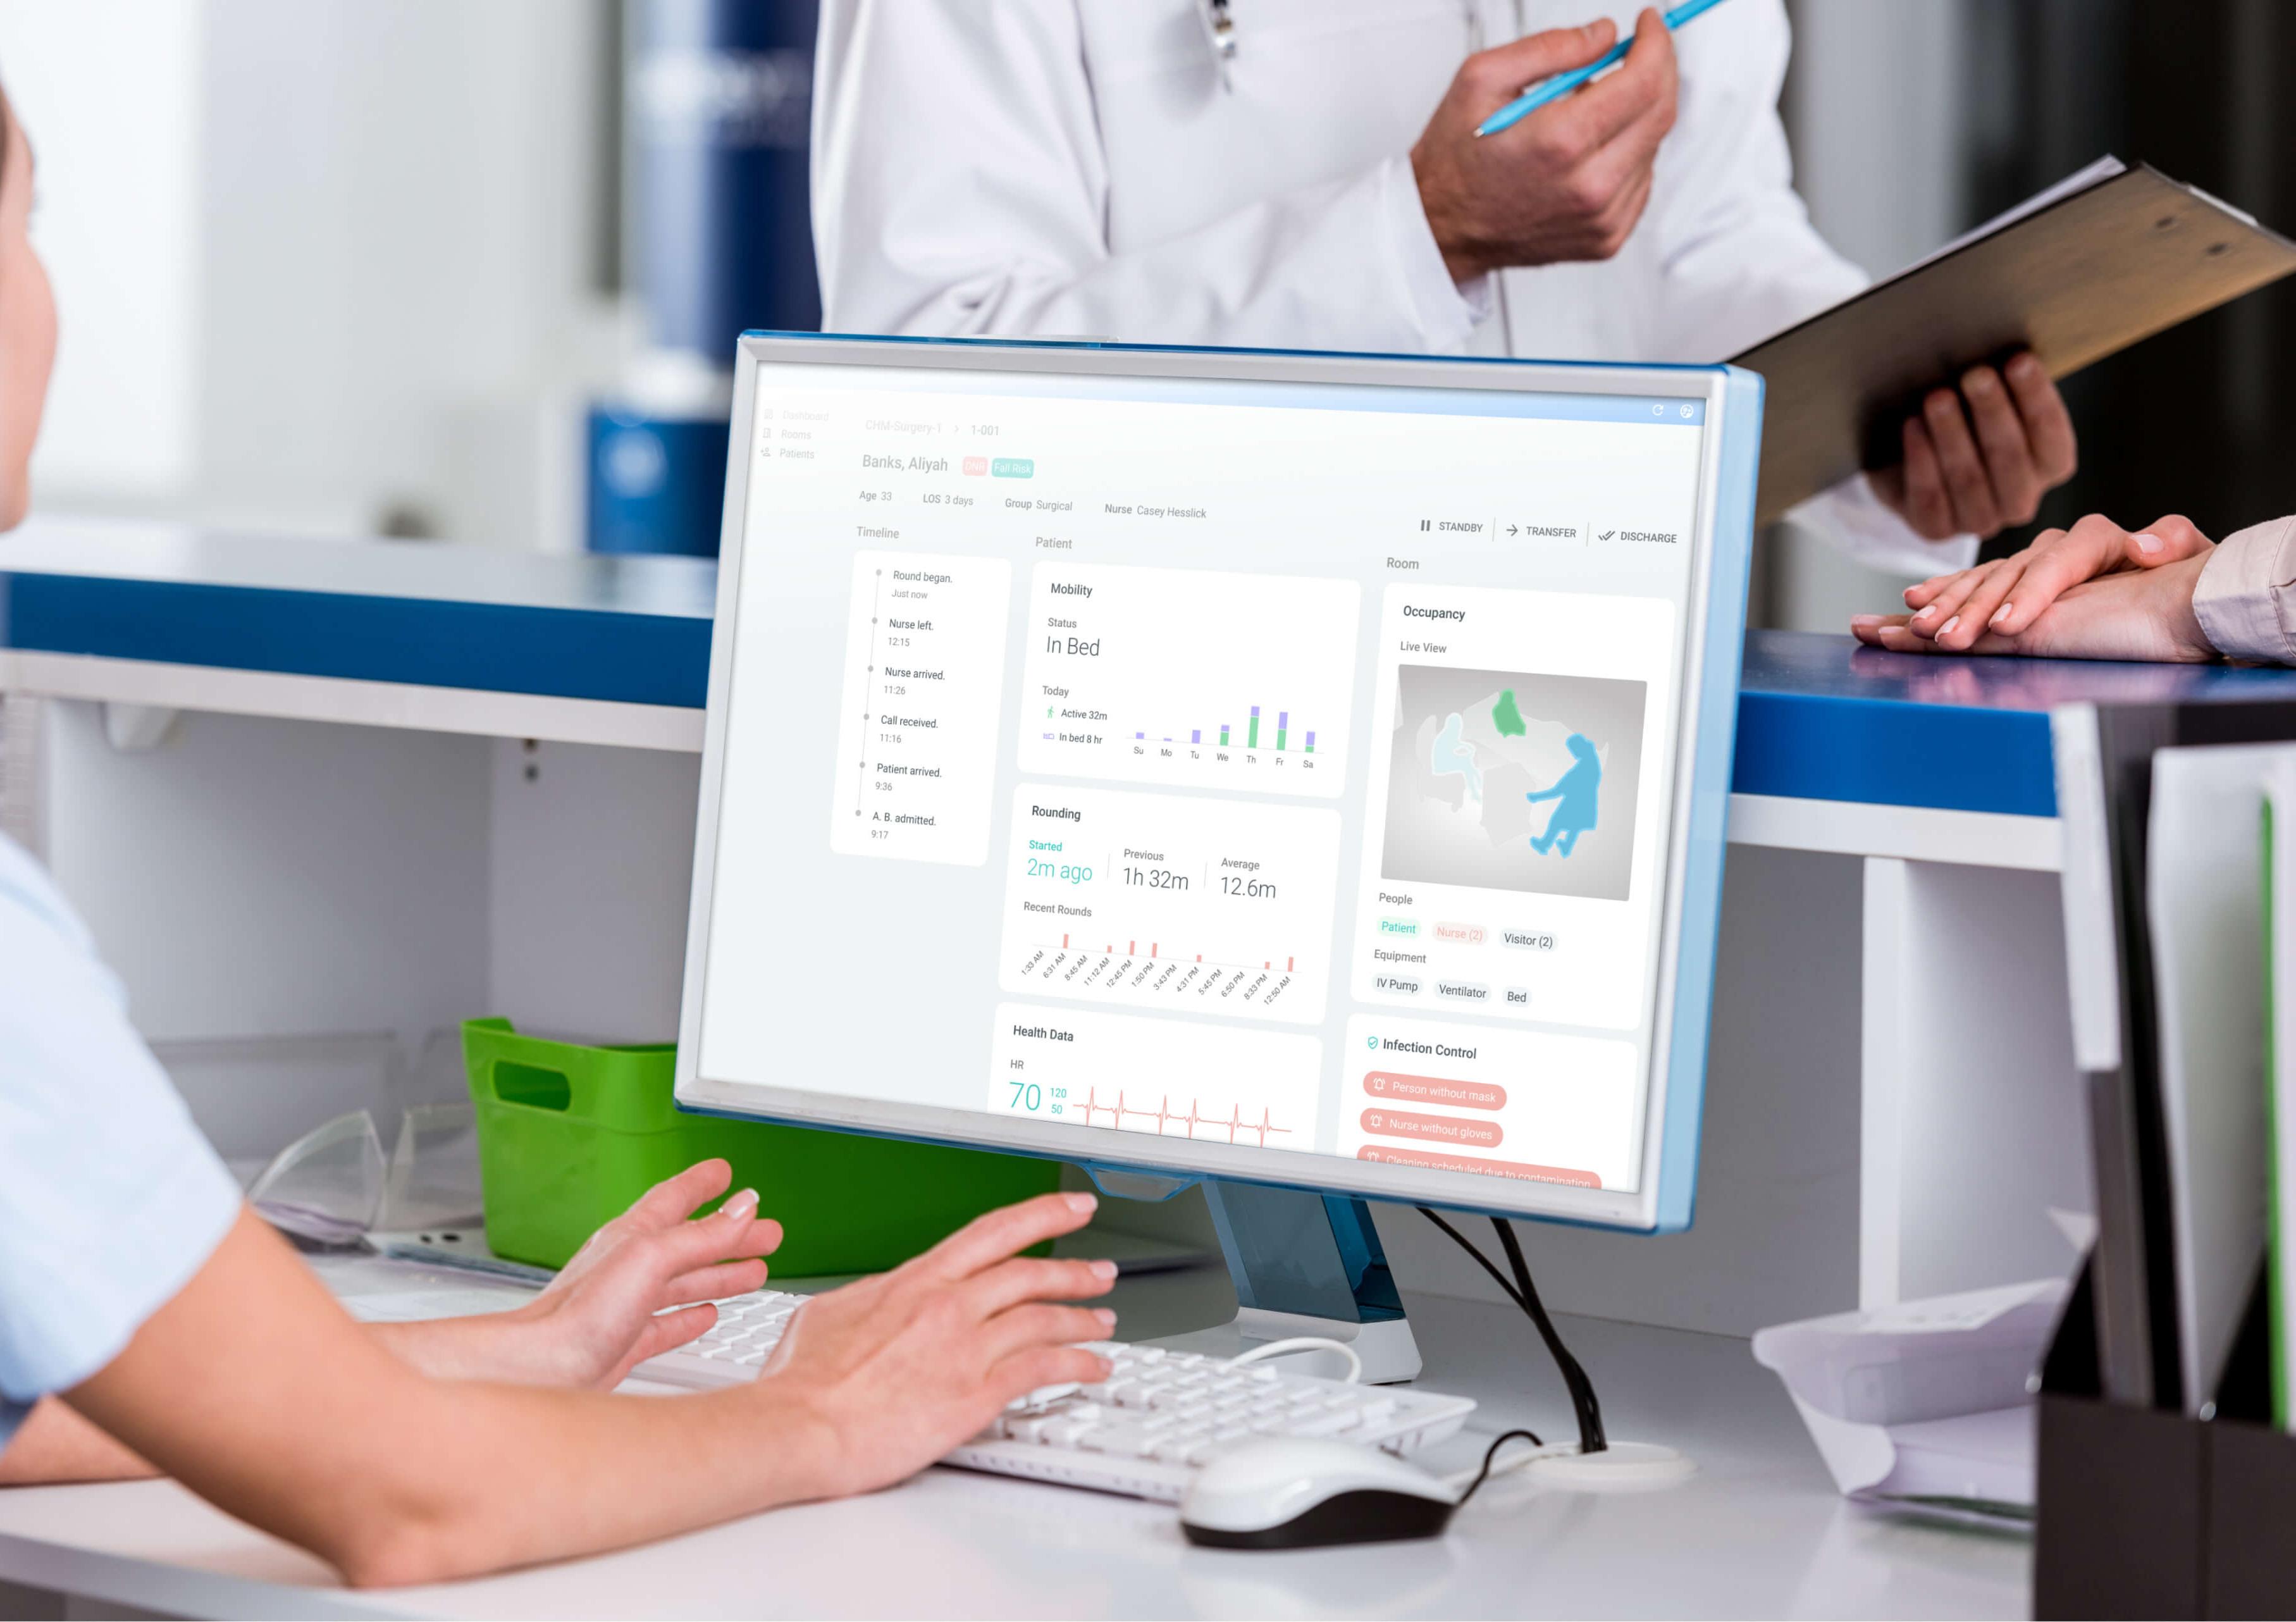 Remote patient monitoring dashboard